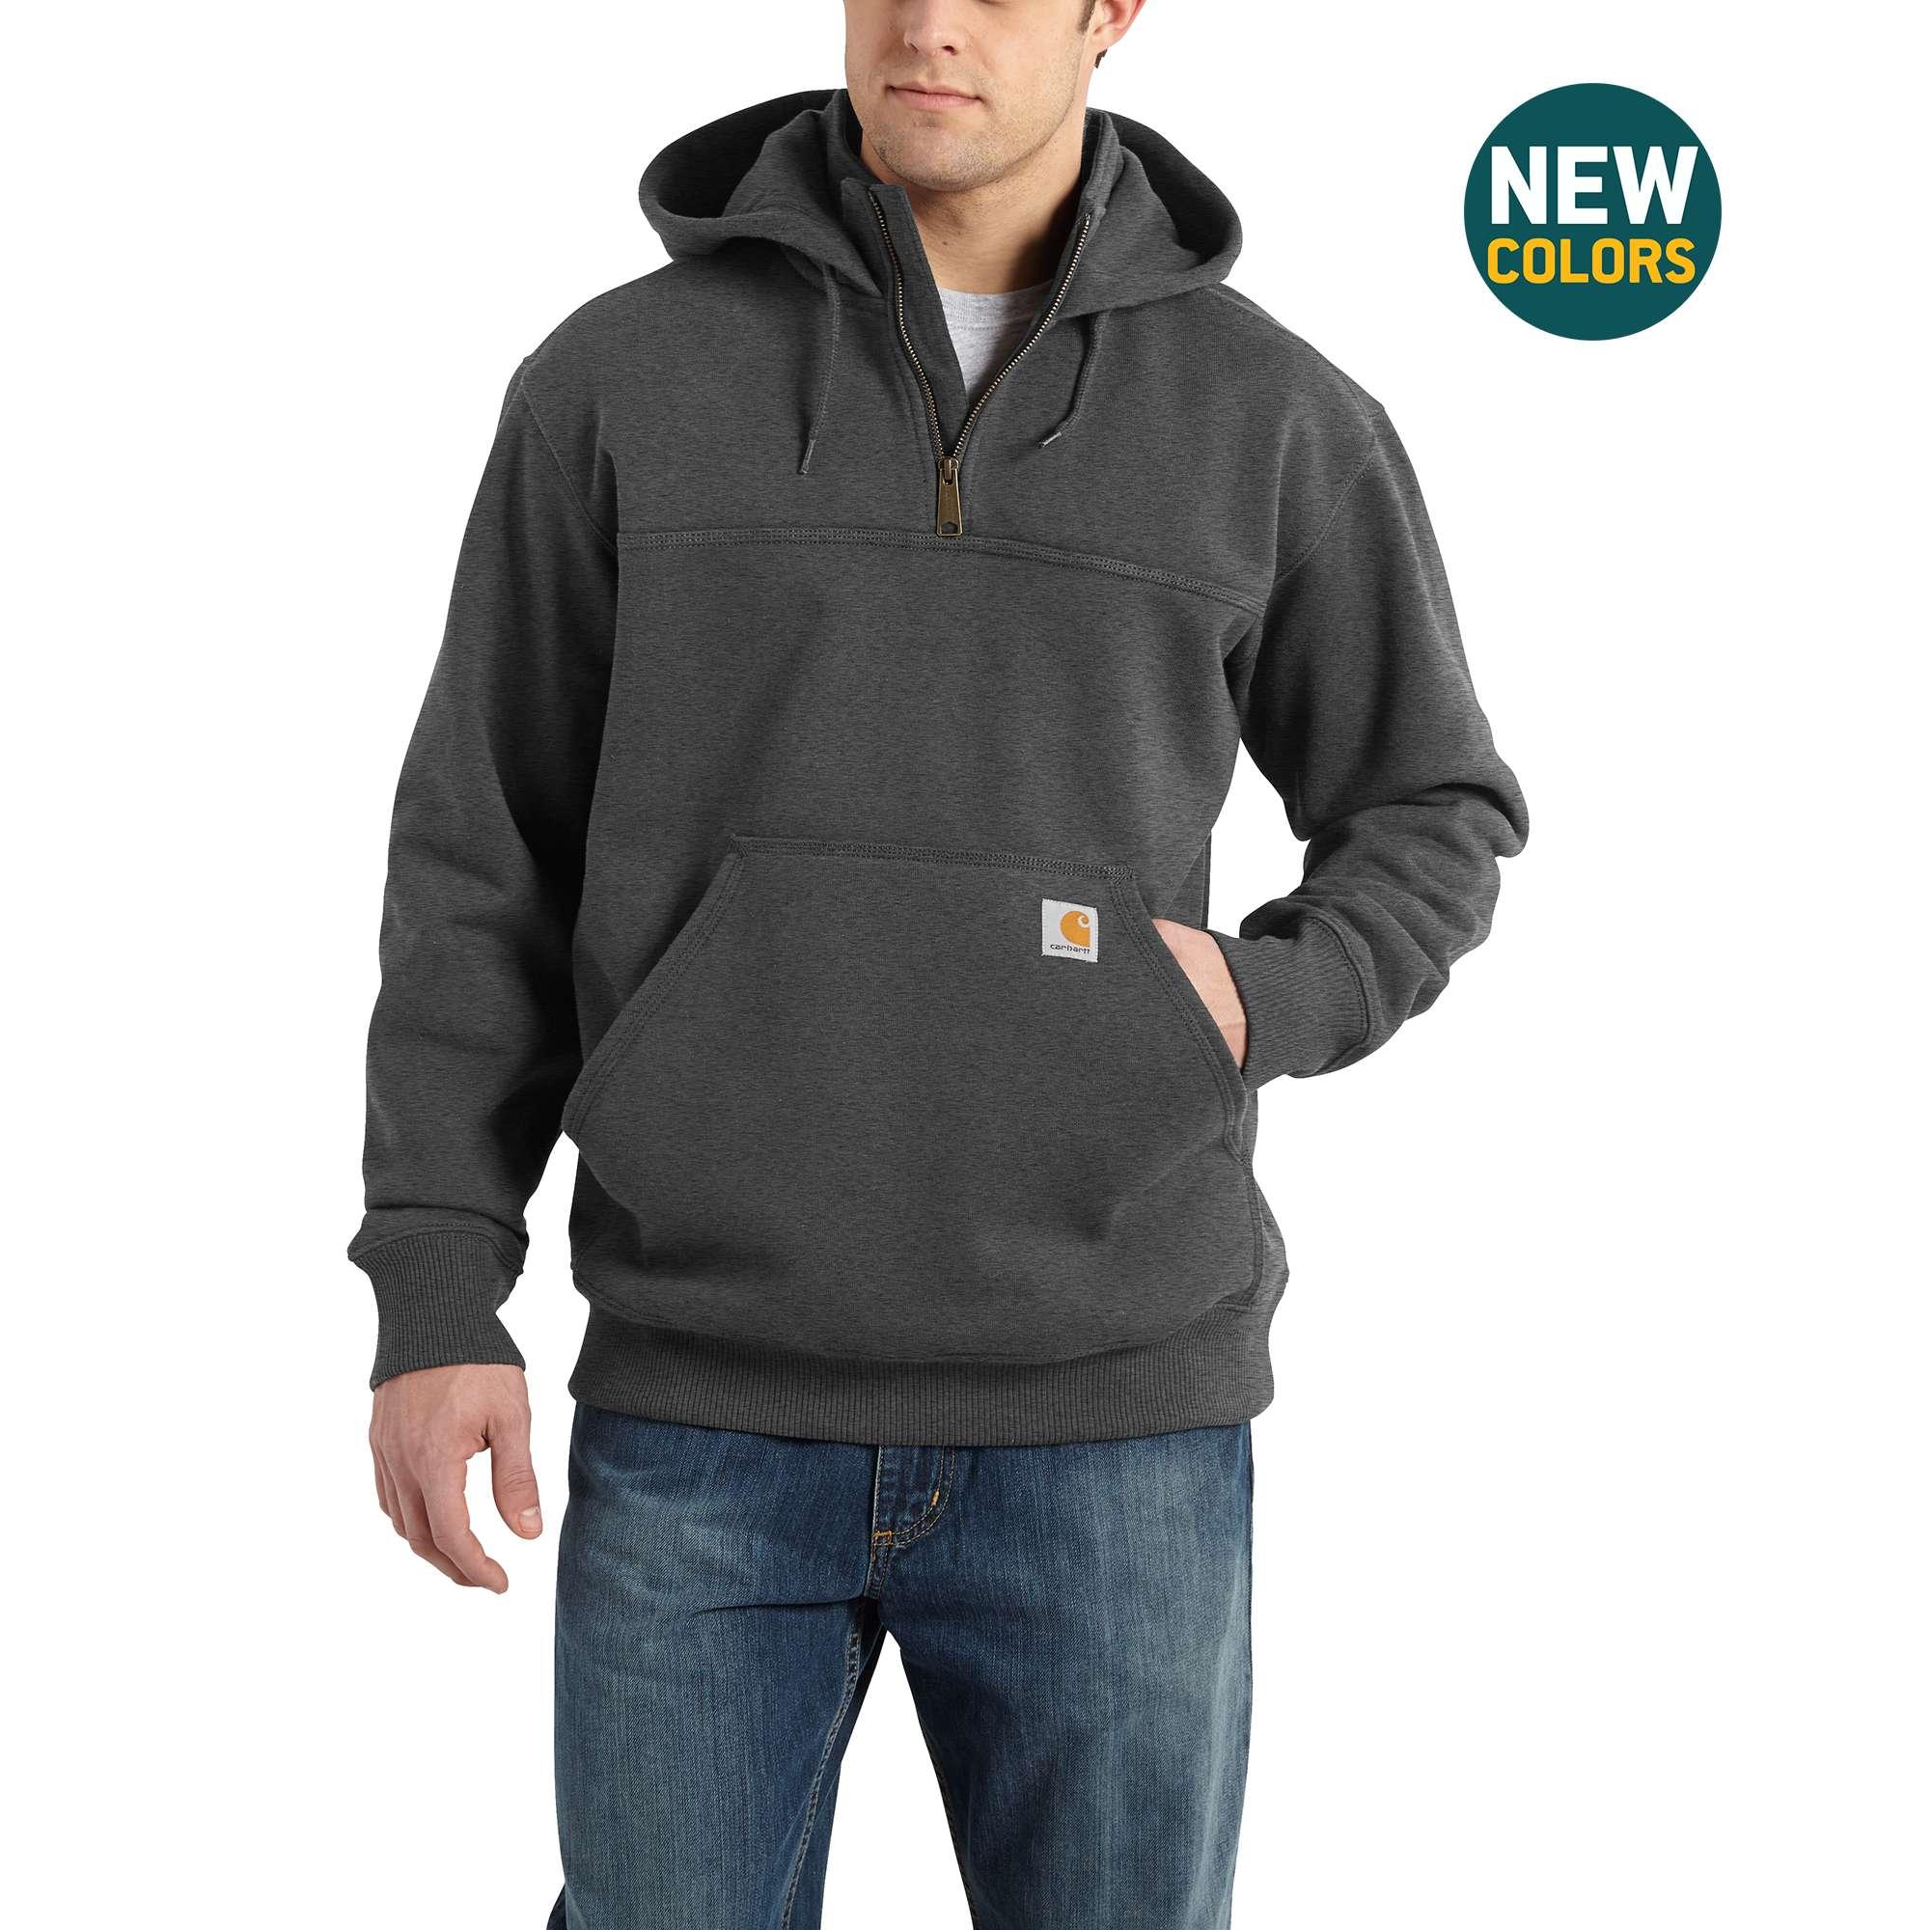 Men's Raindefender Paxton Heavyweight Hooded Zip Mock Sweatshirt, Heather Gray, swatch